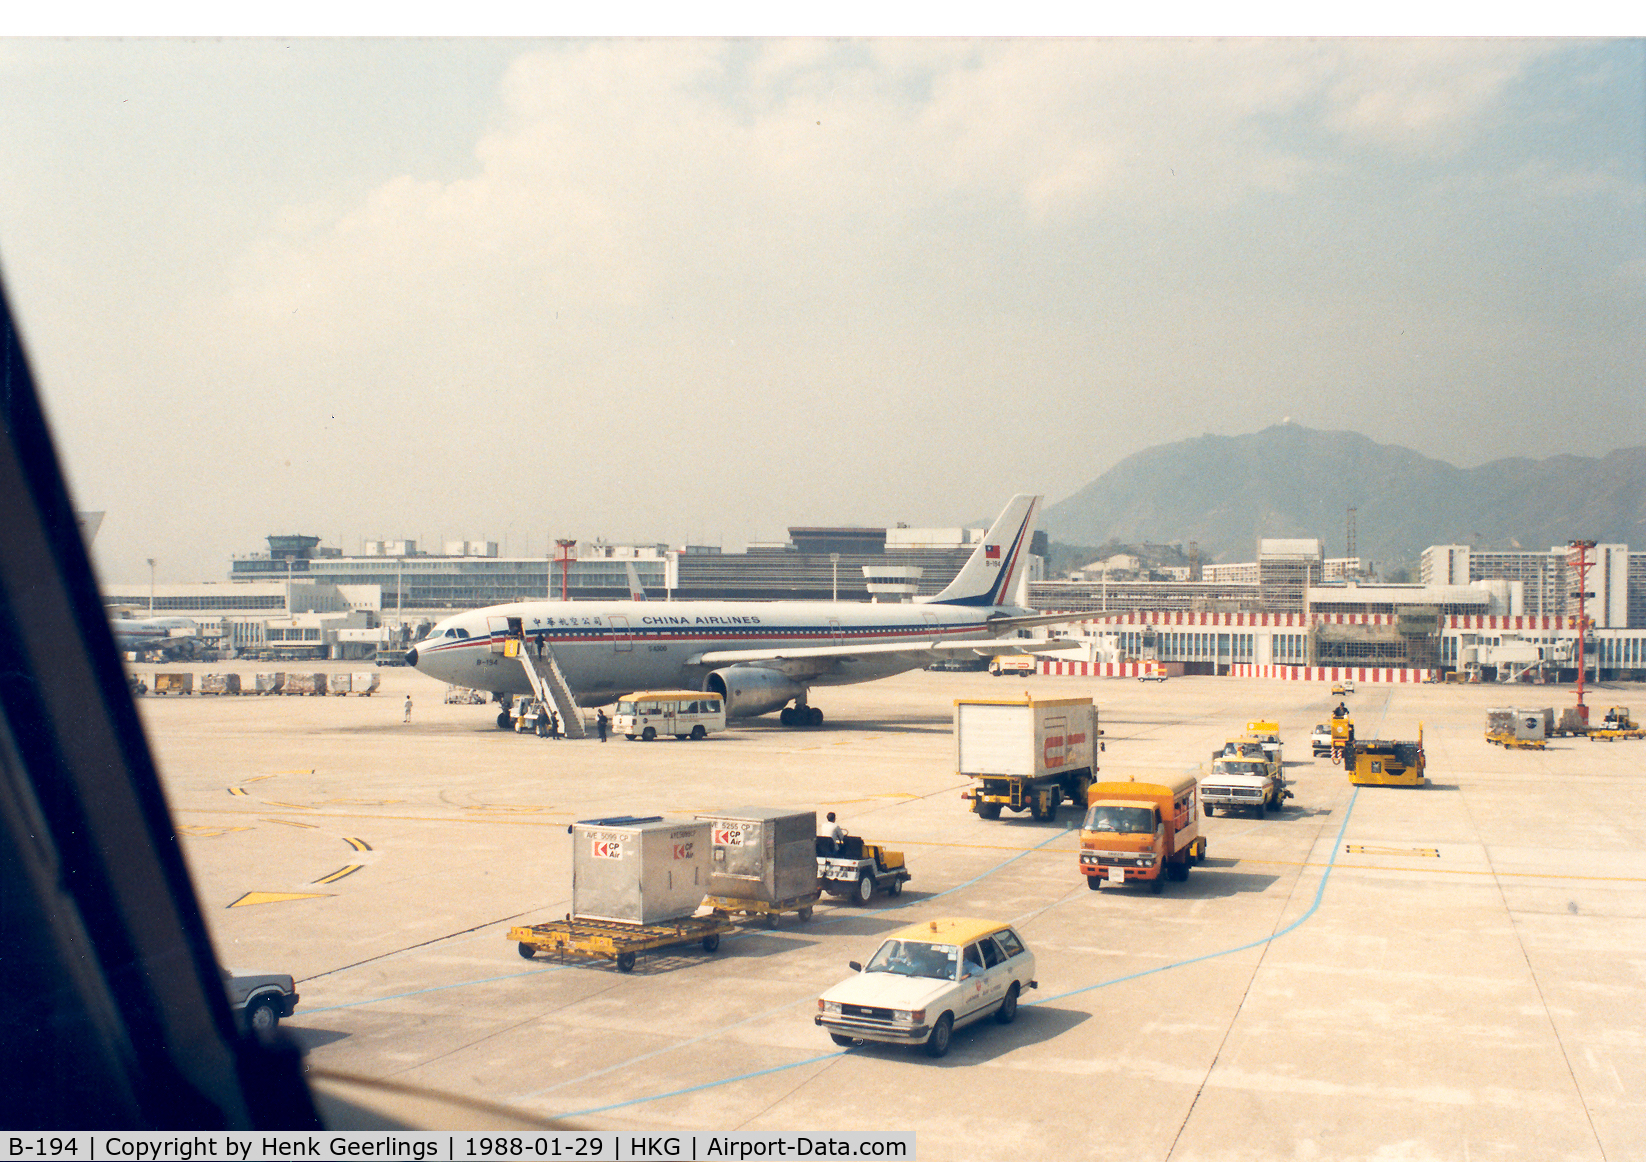 B194, 1982 Airbus A300B4-220 C/N 221, China Airlines , Hongkong Kai Tak Airport